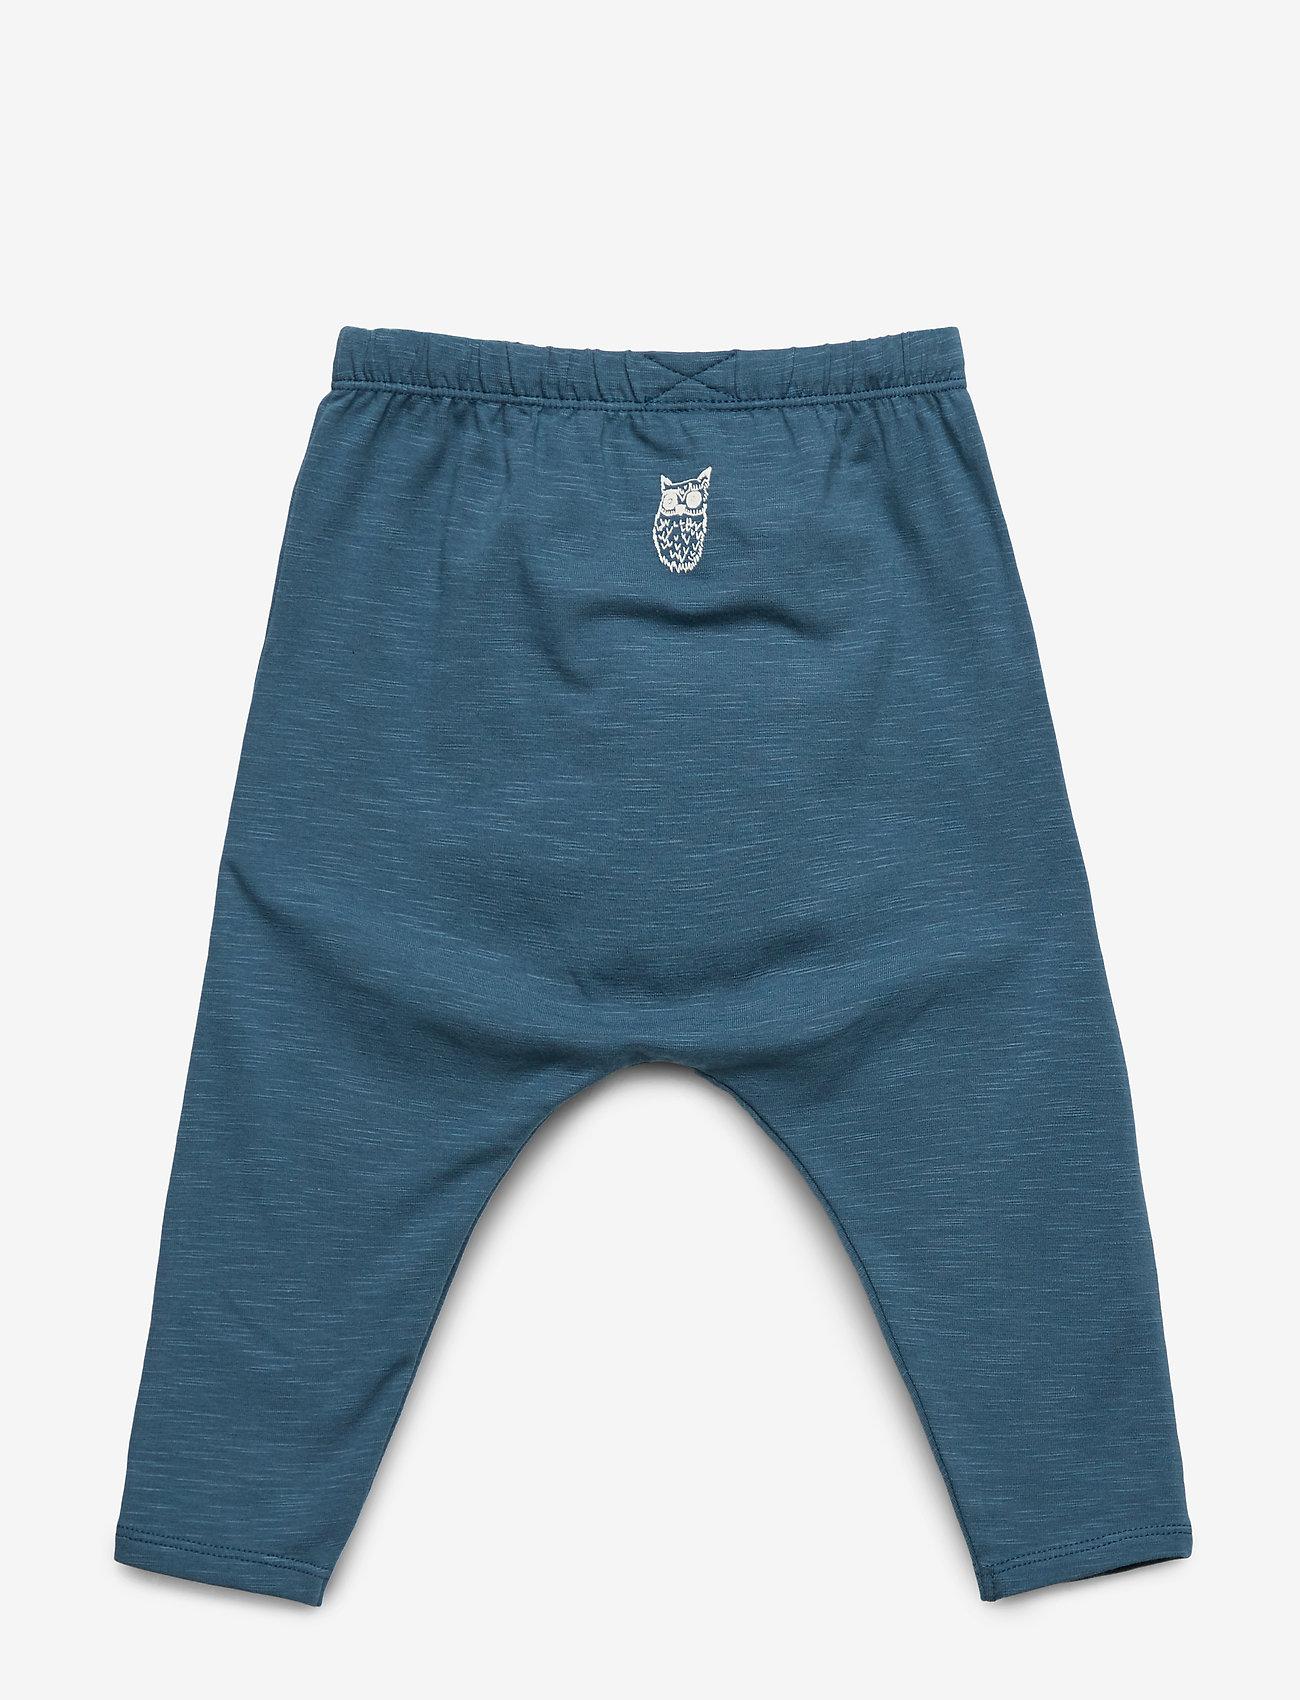 Soft Gallery Hailey Pants - Nederdelar Orion Blue, Owl